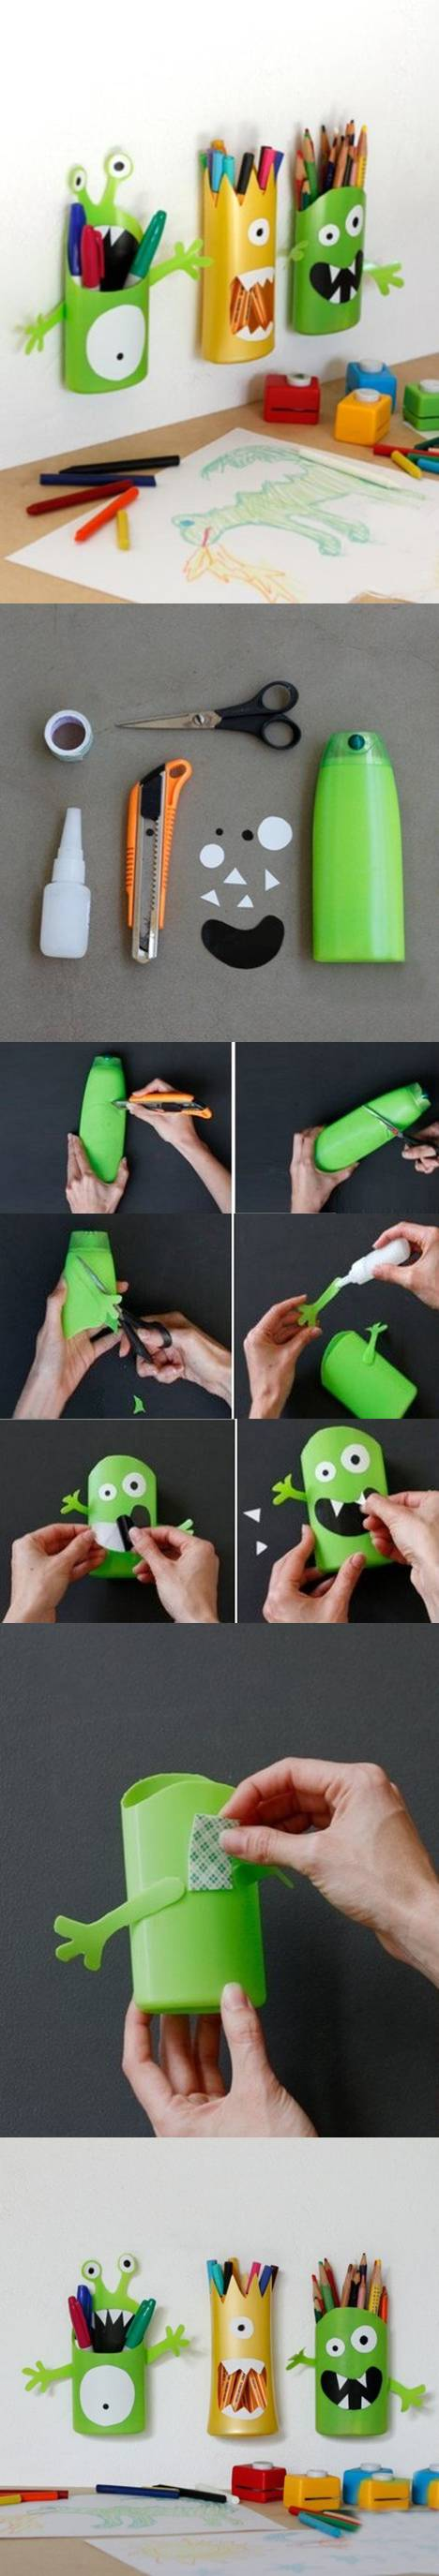 DIY-Shampoo-Bottle-Monster-Pencil-Holder (5)